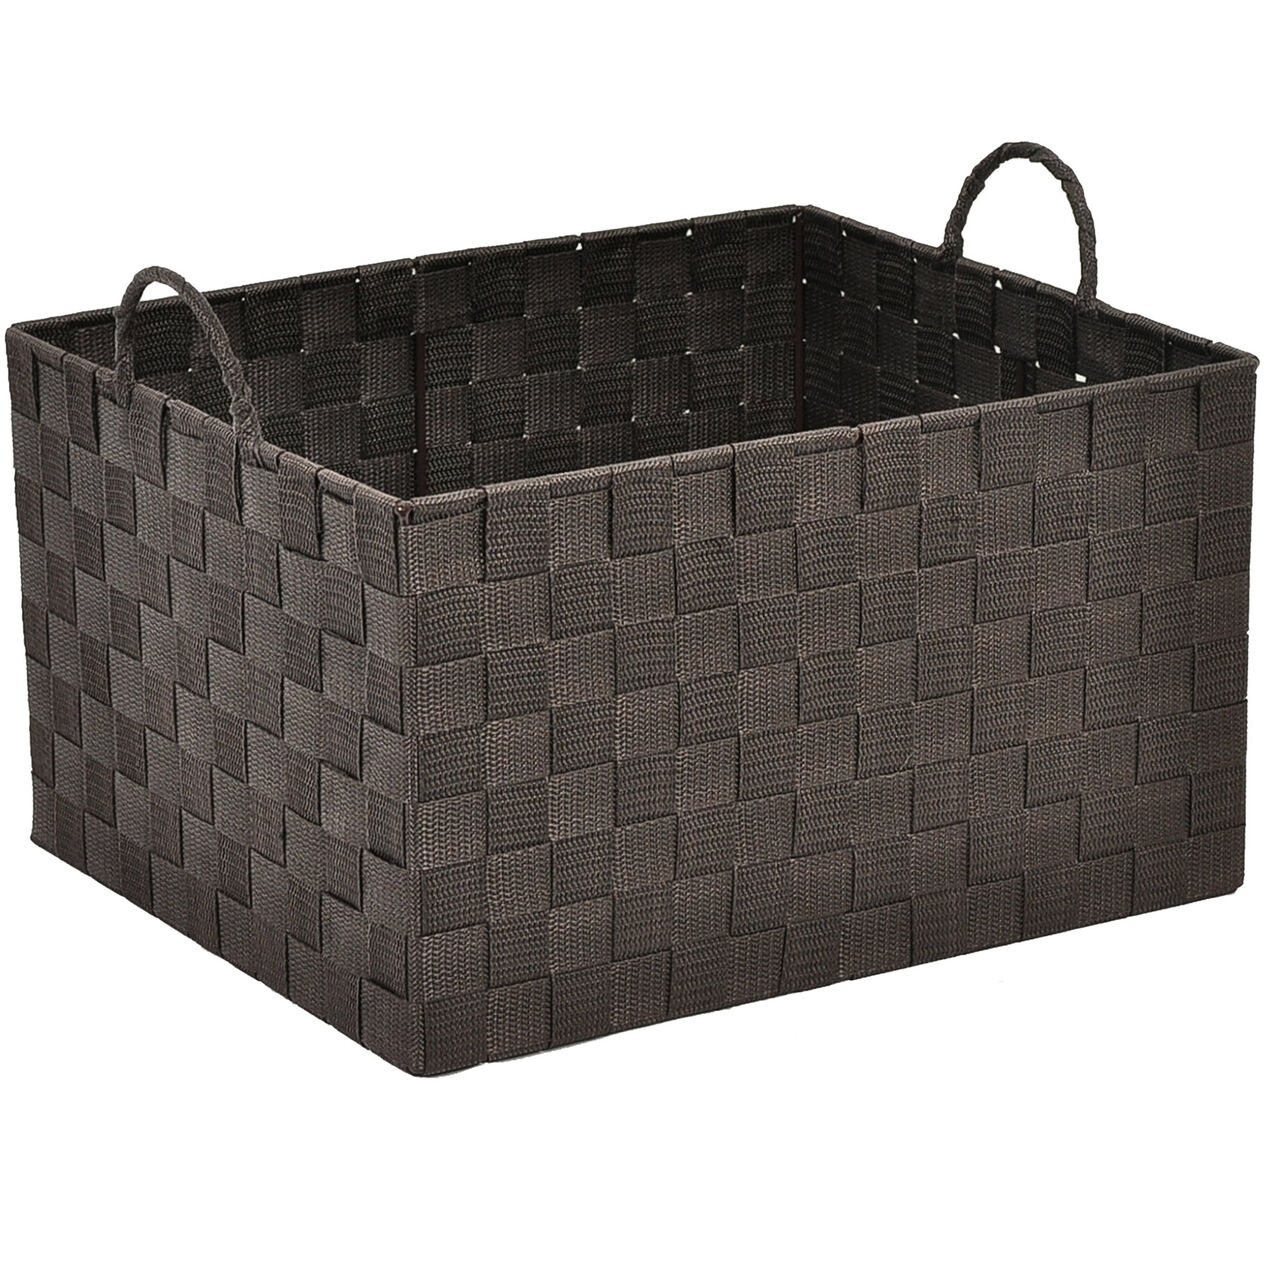 Closet storage bins and baskets - Large Nylon Basket Brown